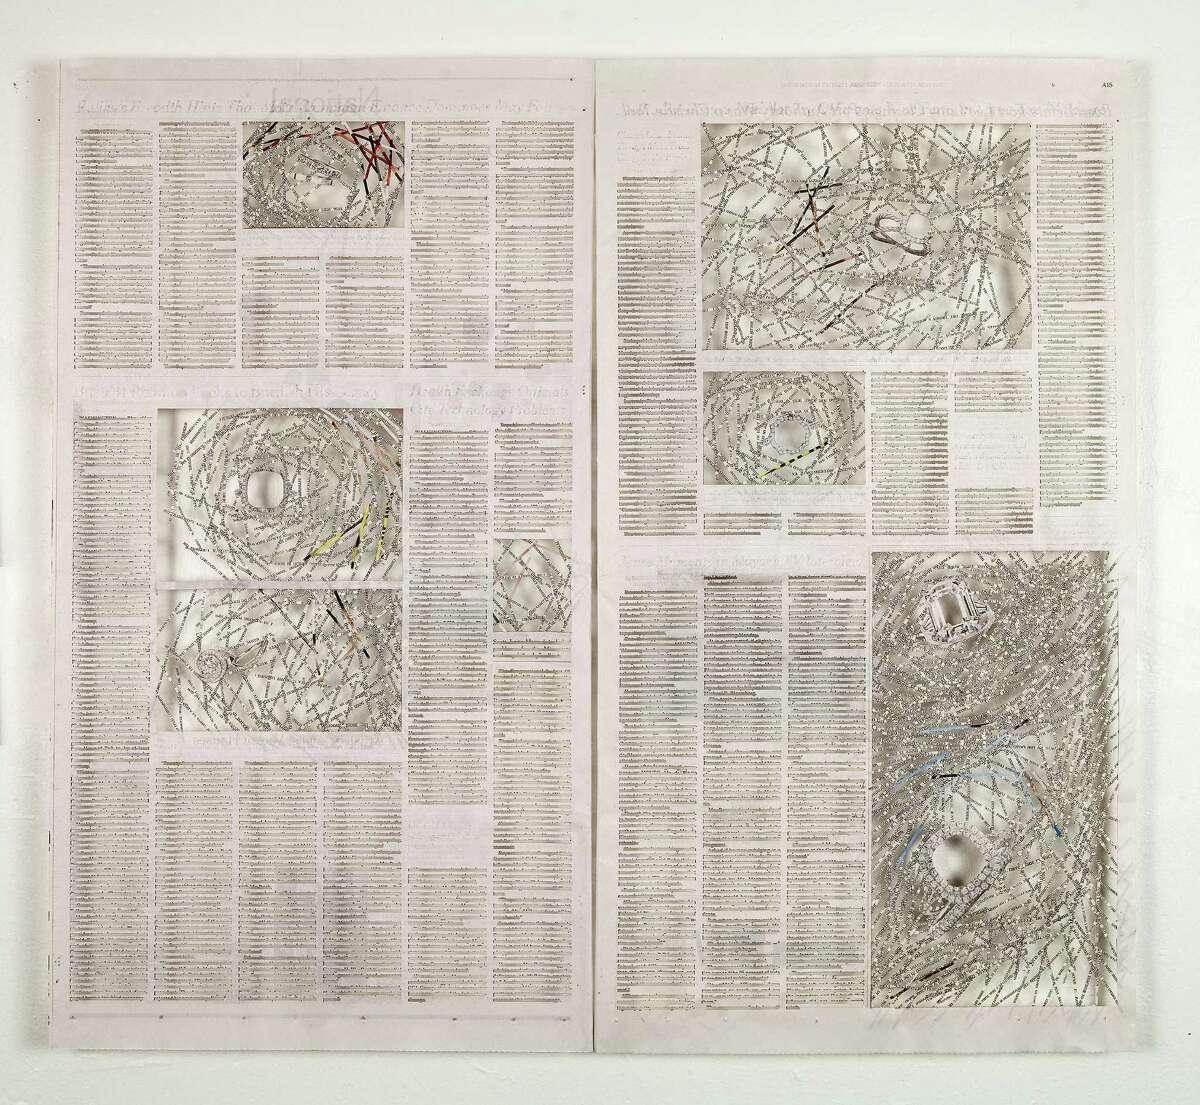 Shanti Grumbine, Zero (detail), 2014, de-acidified New York Times newspaper, jade glue, 22 x 24 inches